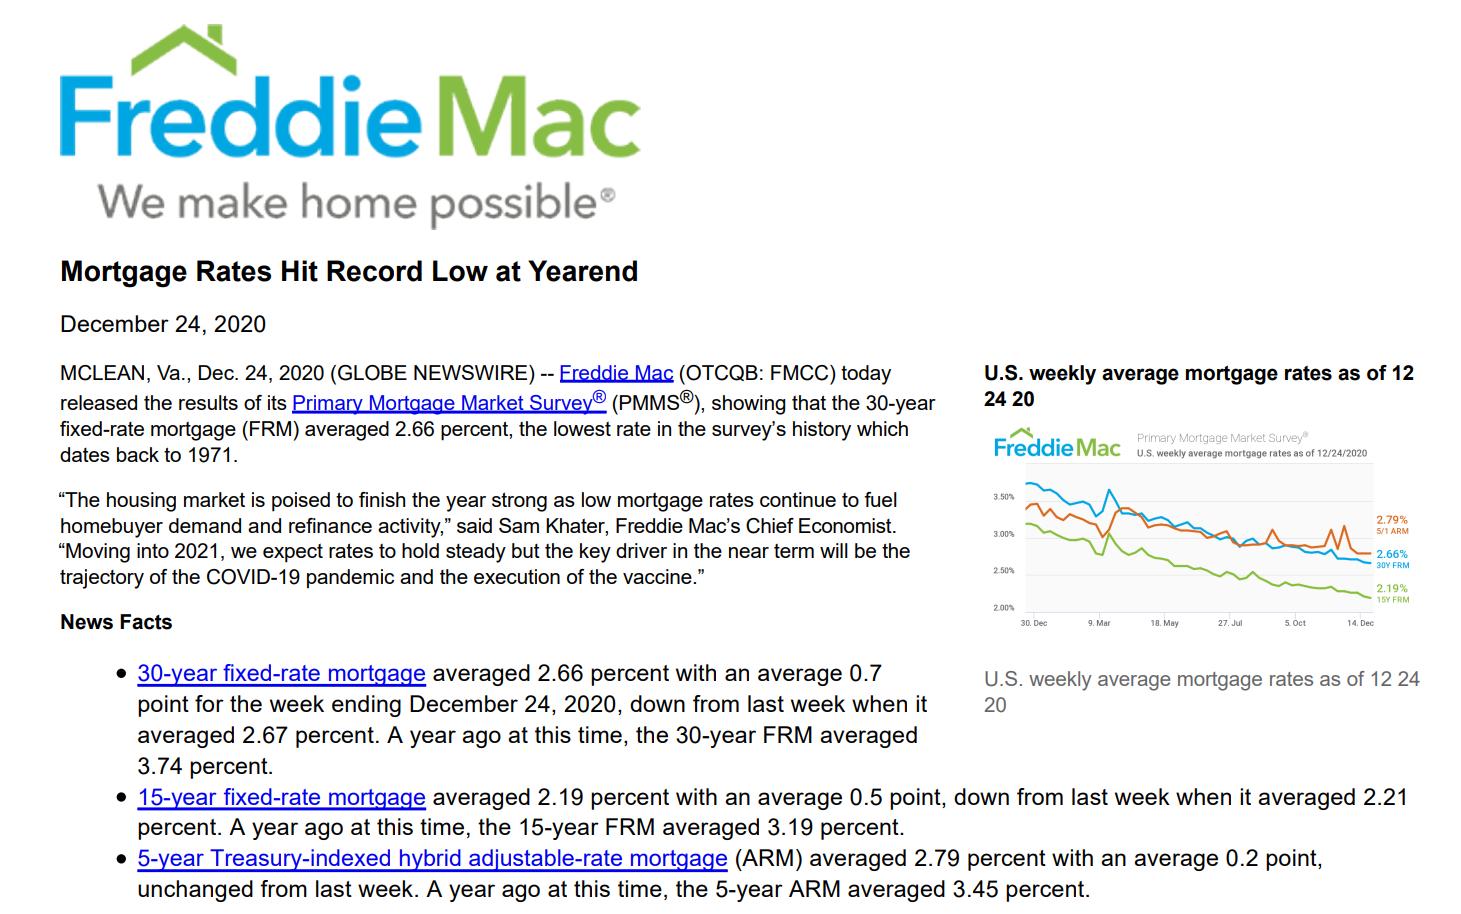 usdt支付接口(caibao.it):美国三十年牢固房贷利率再度刷新历史新低 但疫情肆虐下楼市成交量已现疲态 第1张